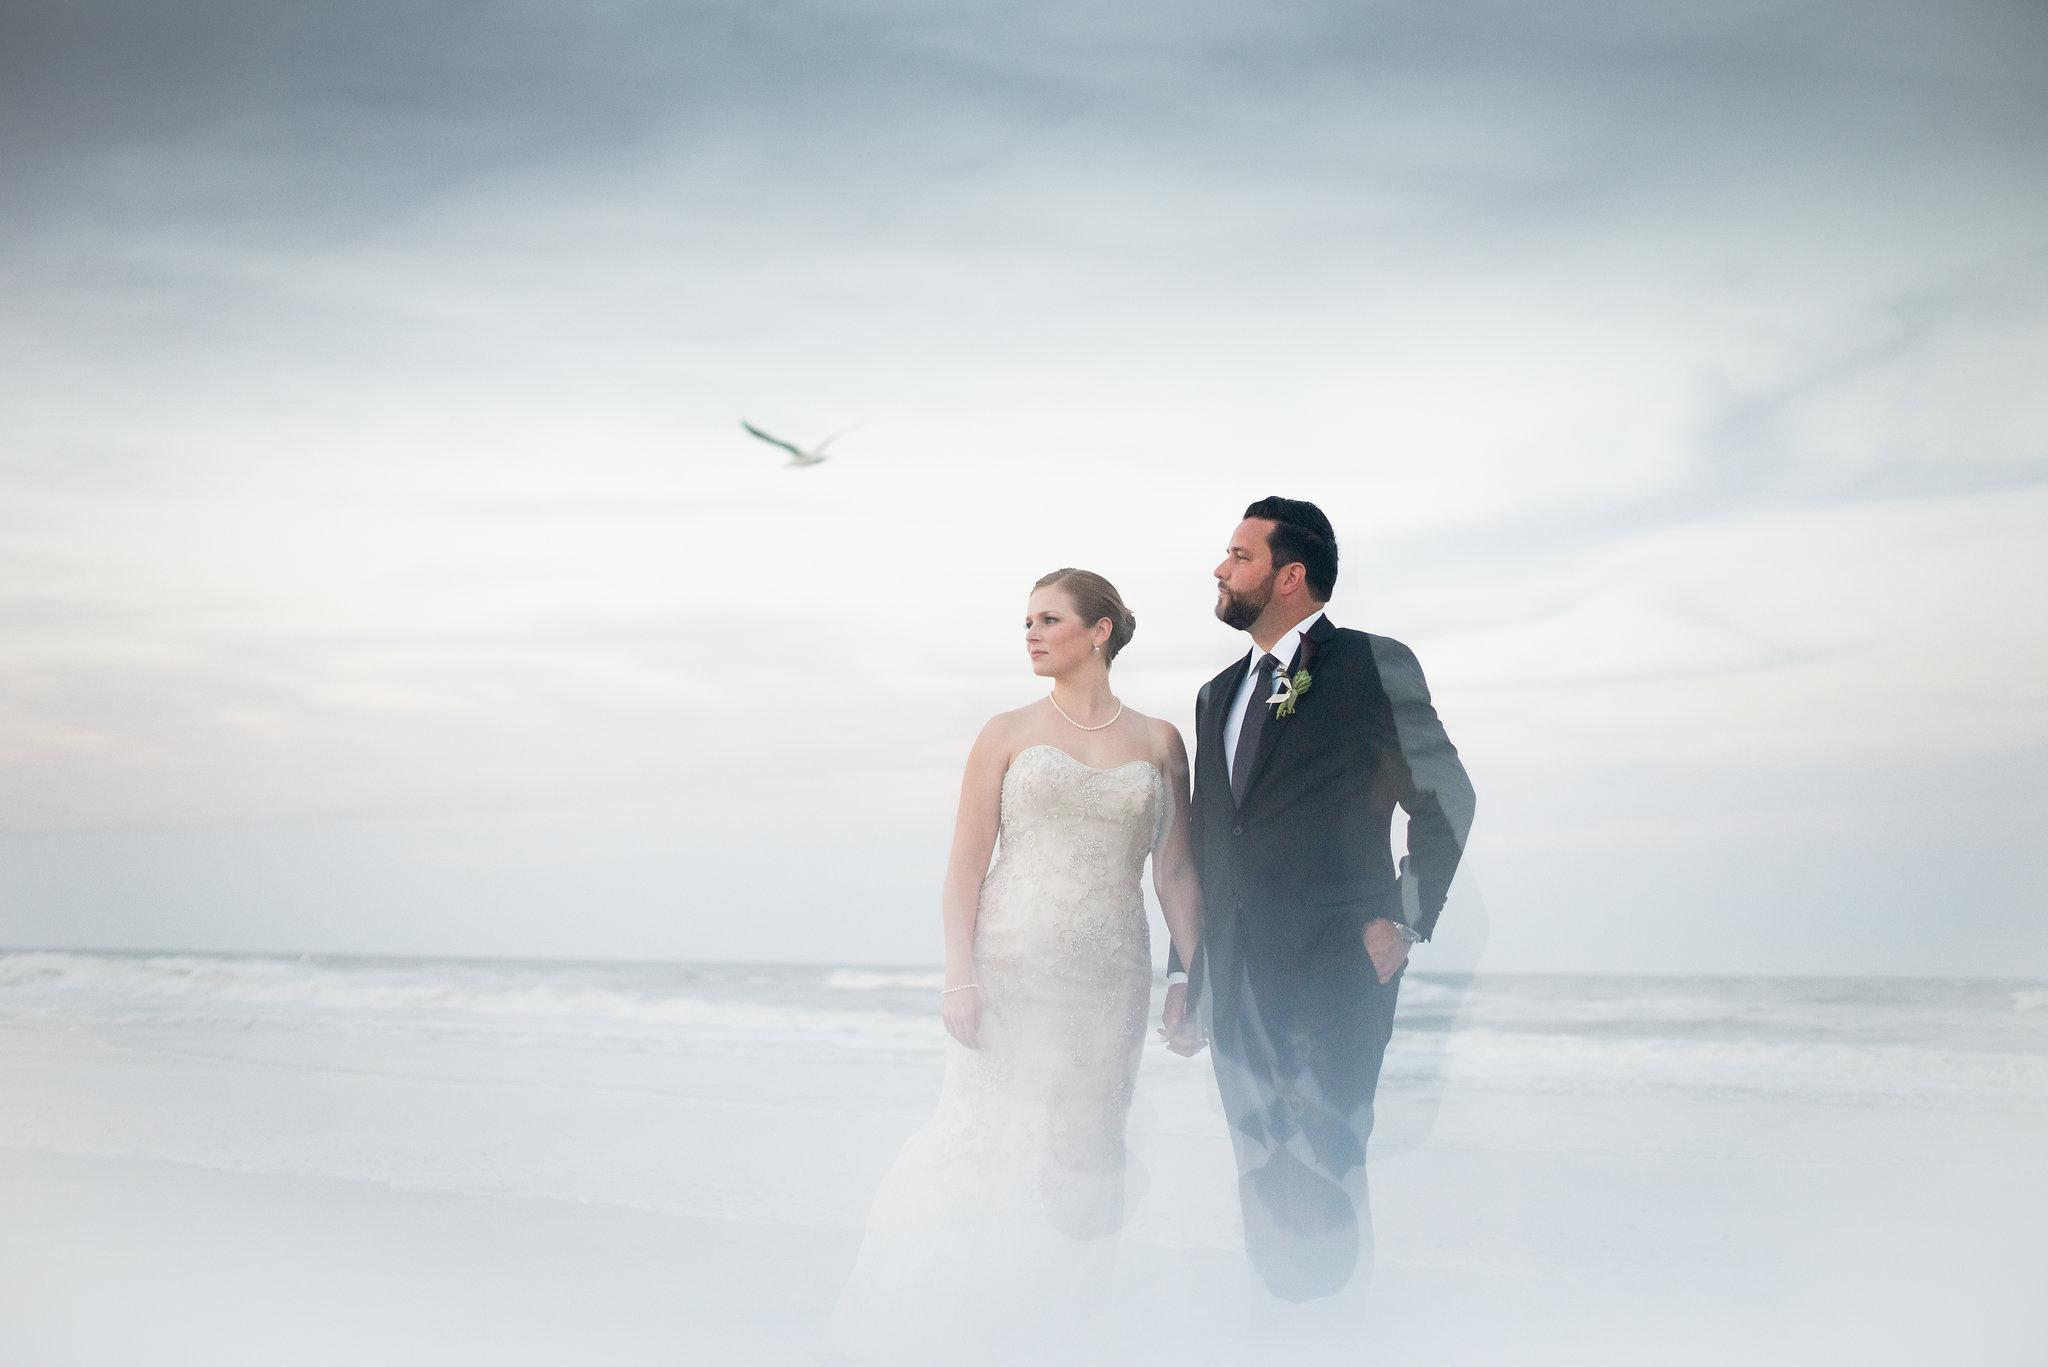 st-augustine-wedding-photographer-sarah-annay-photography.jpg29.jpg